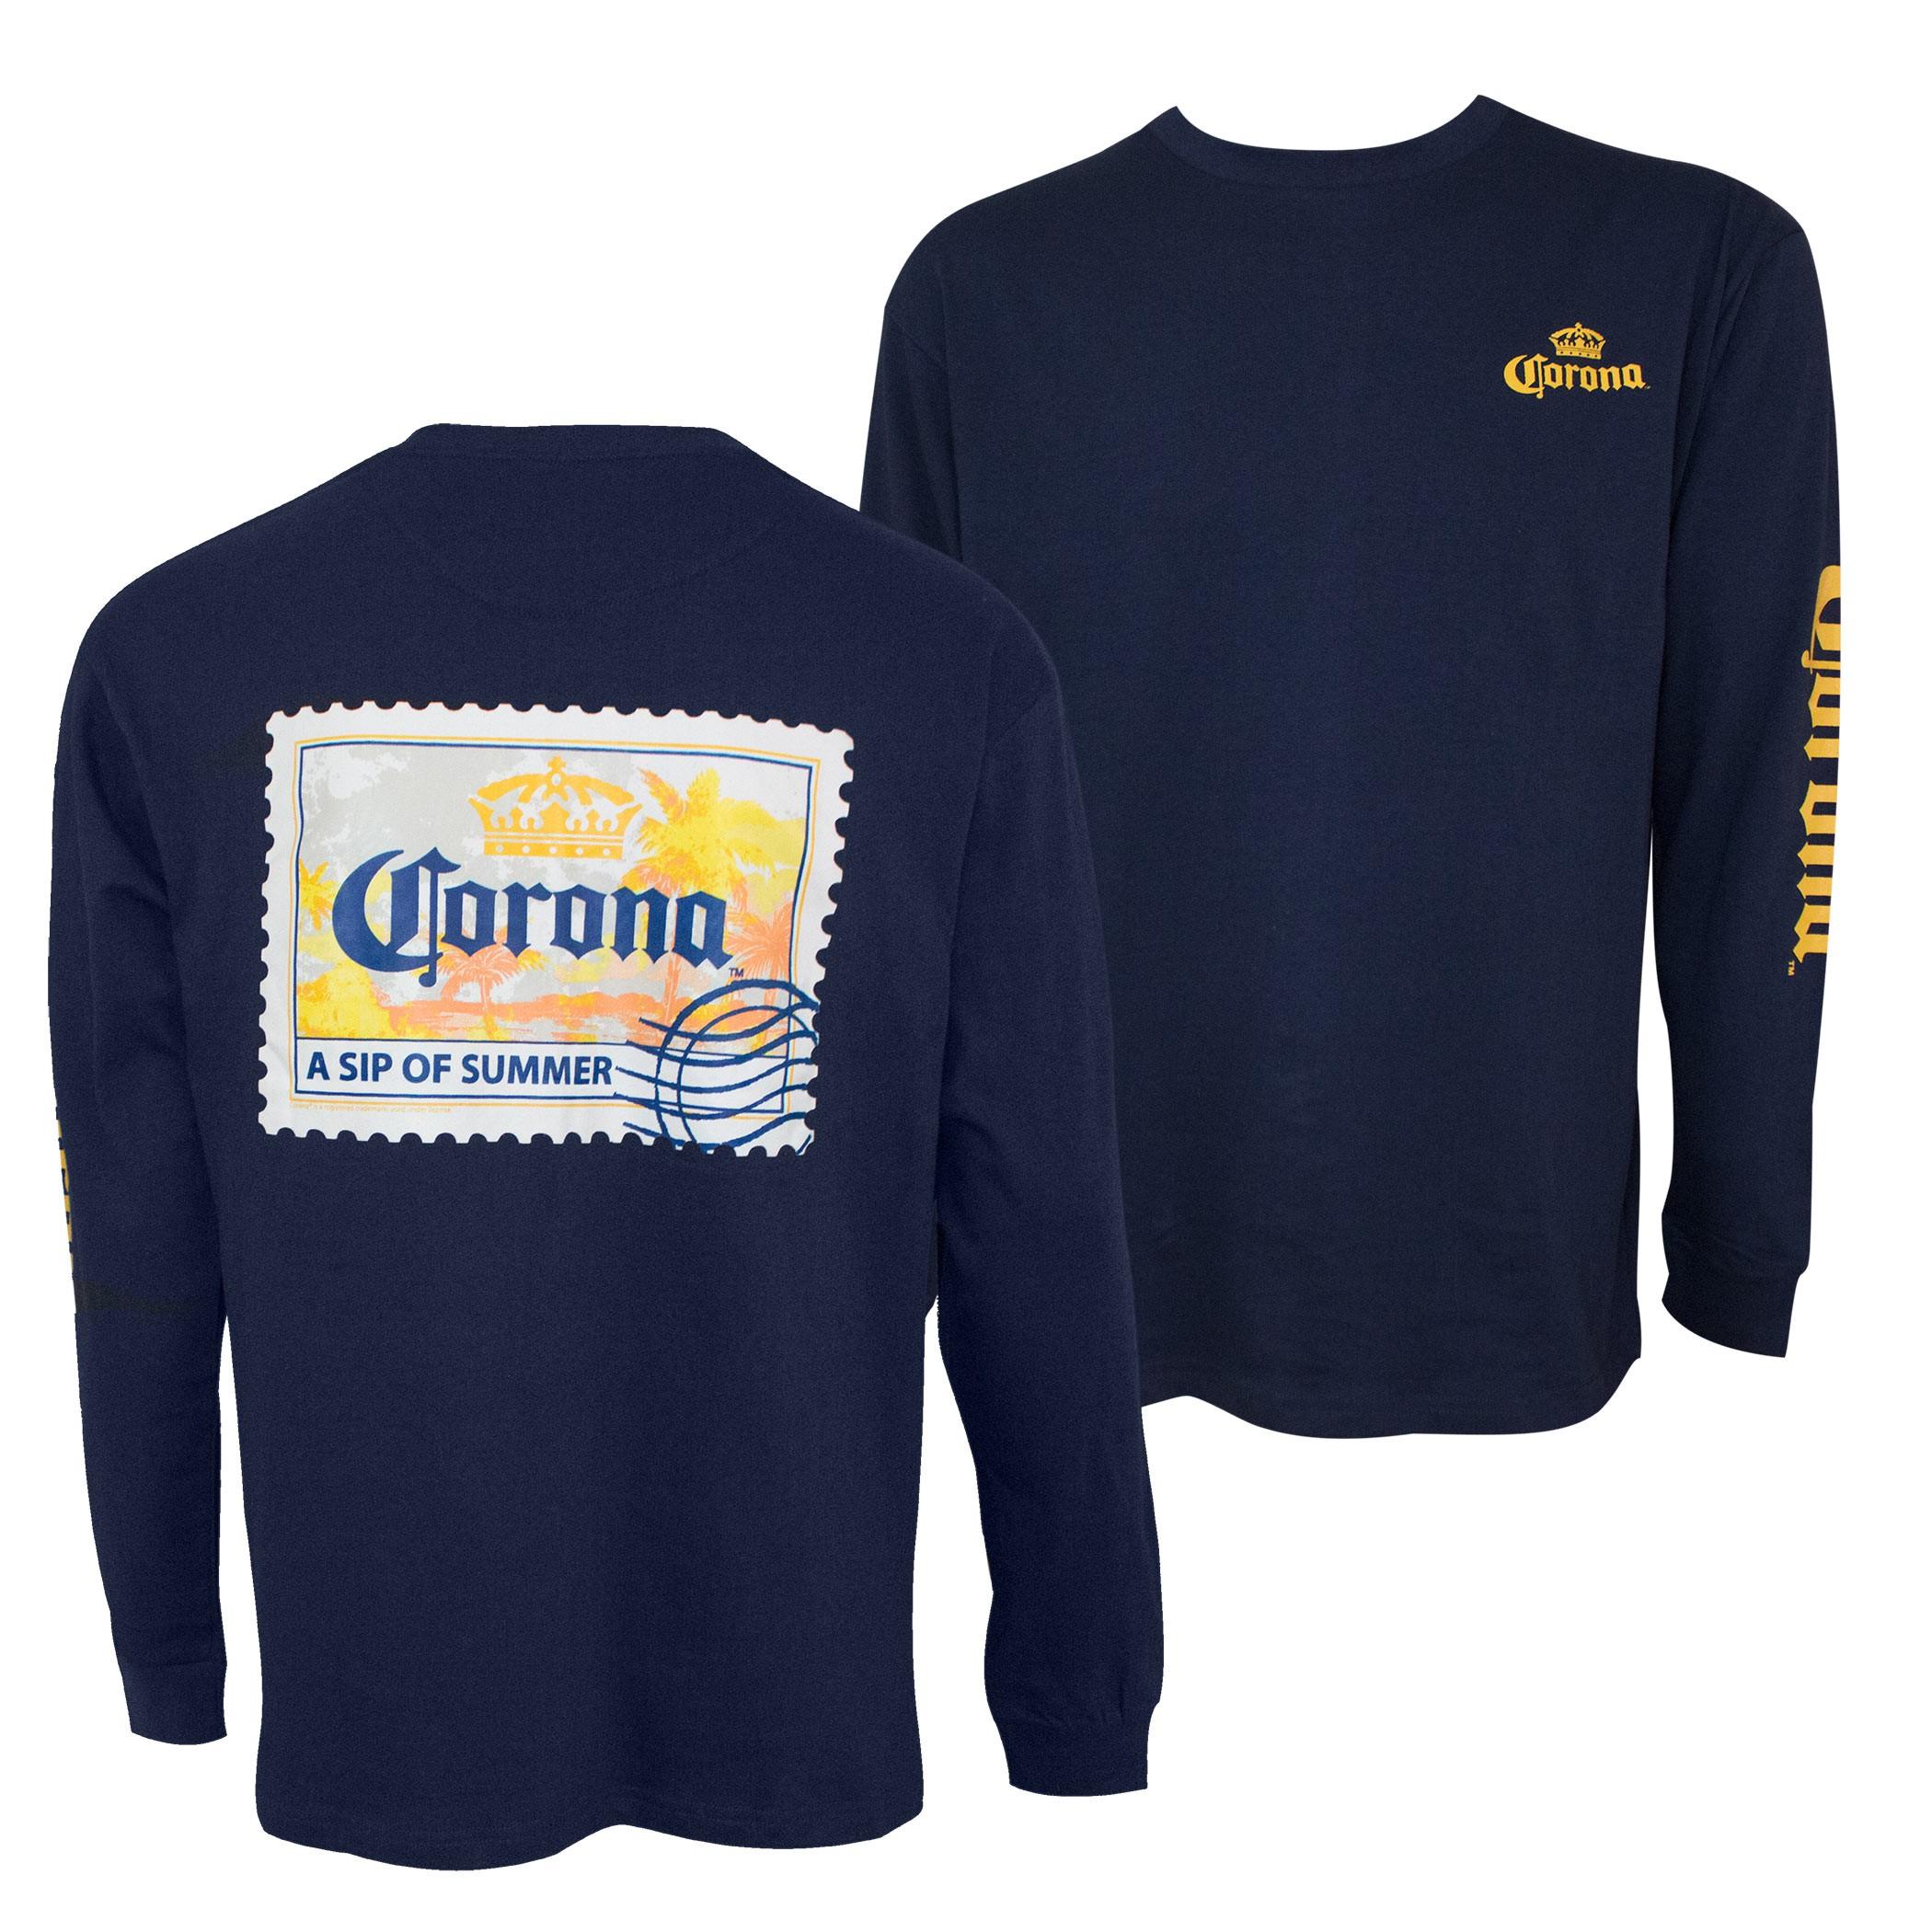 Corona Relax Responsibly Long Sleeve Shirt